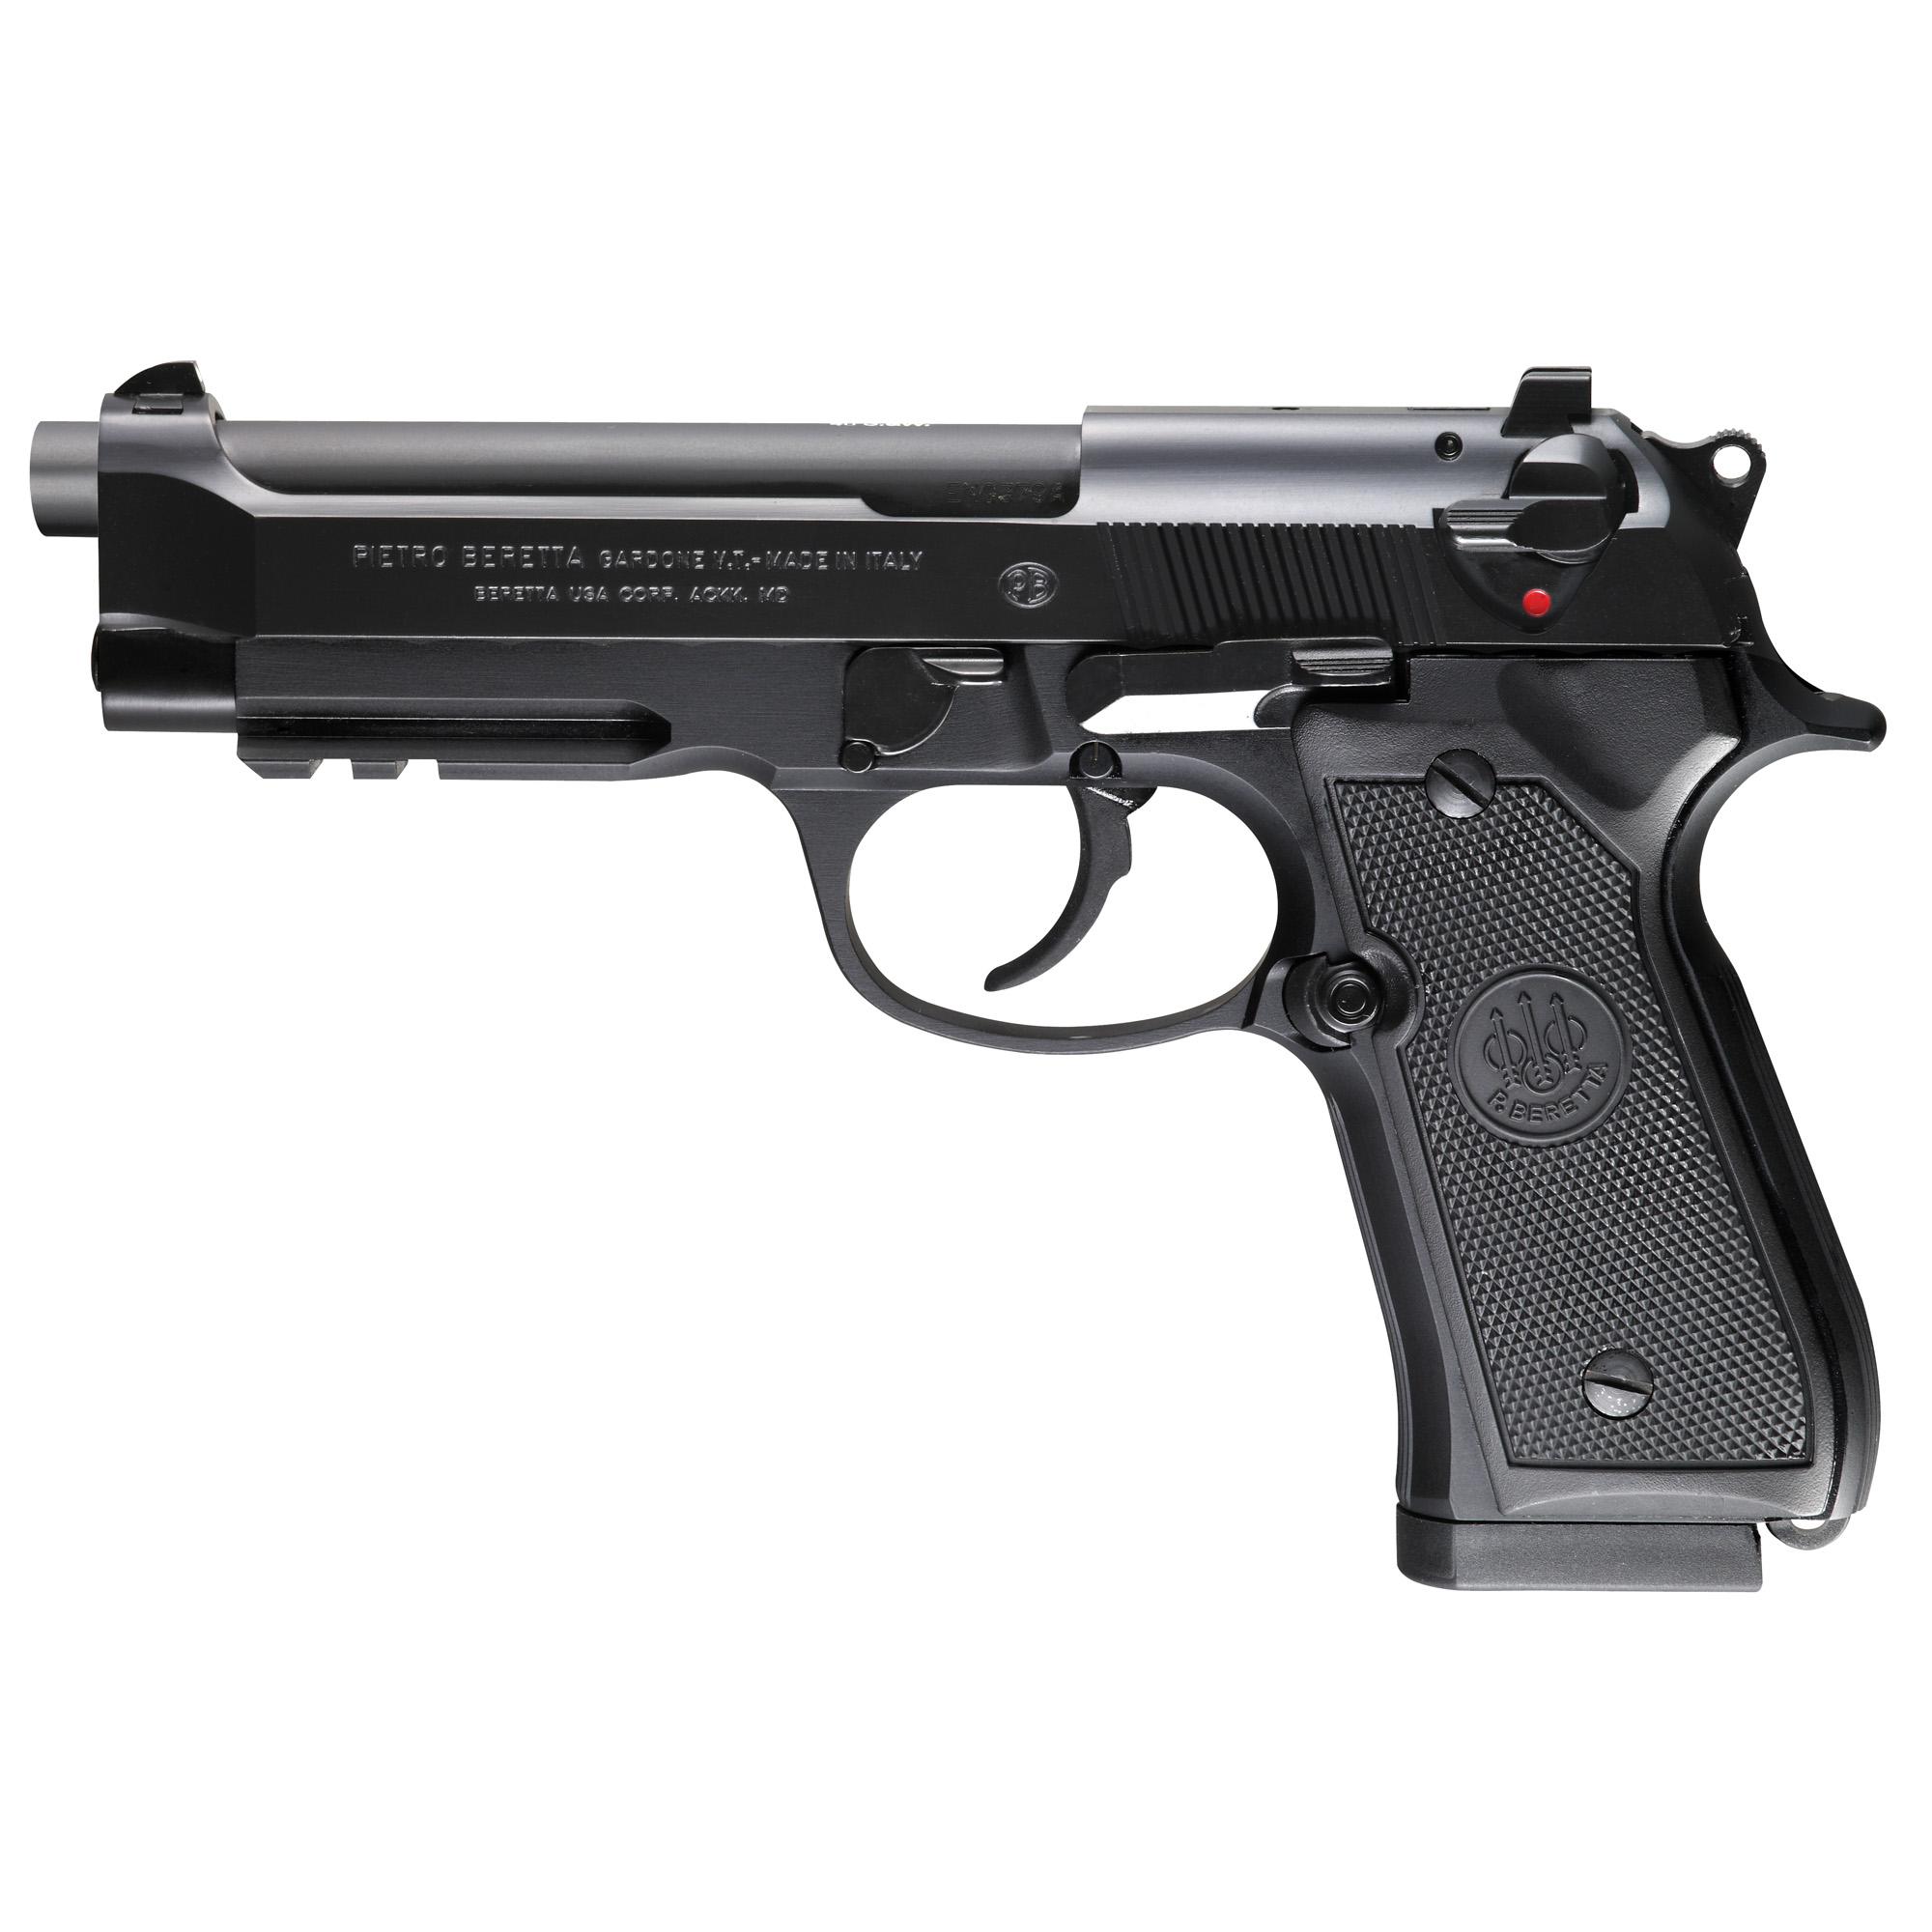 "Beretta 96a1 40sw 4.9"" Bl 3-10rd"